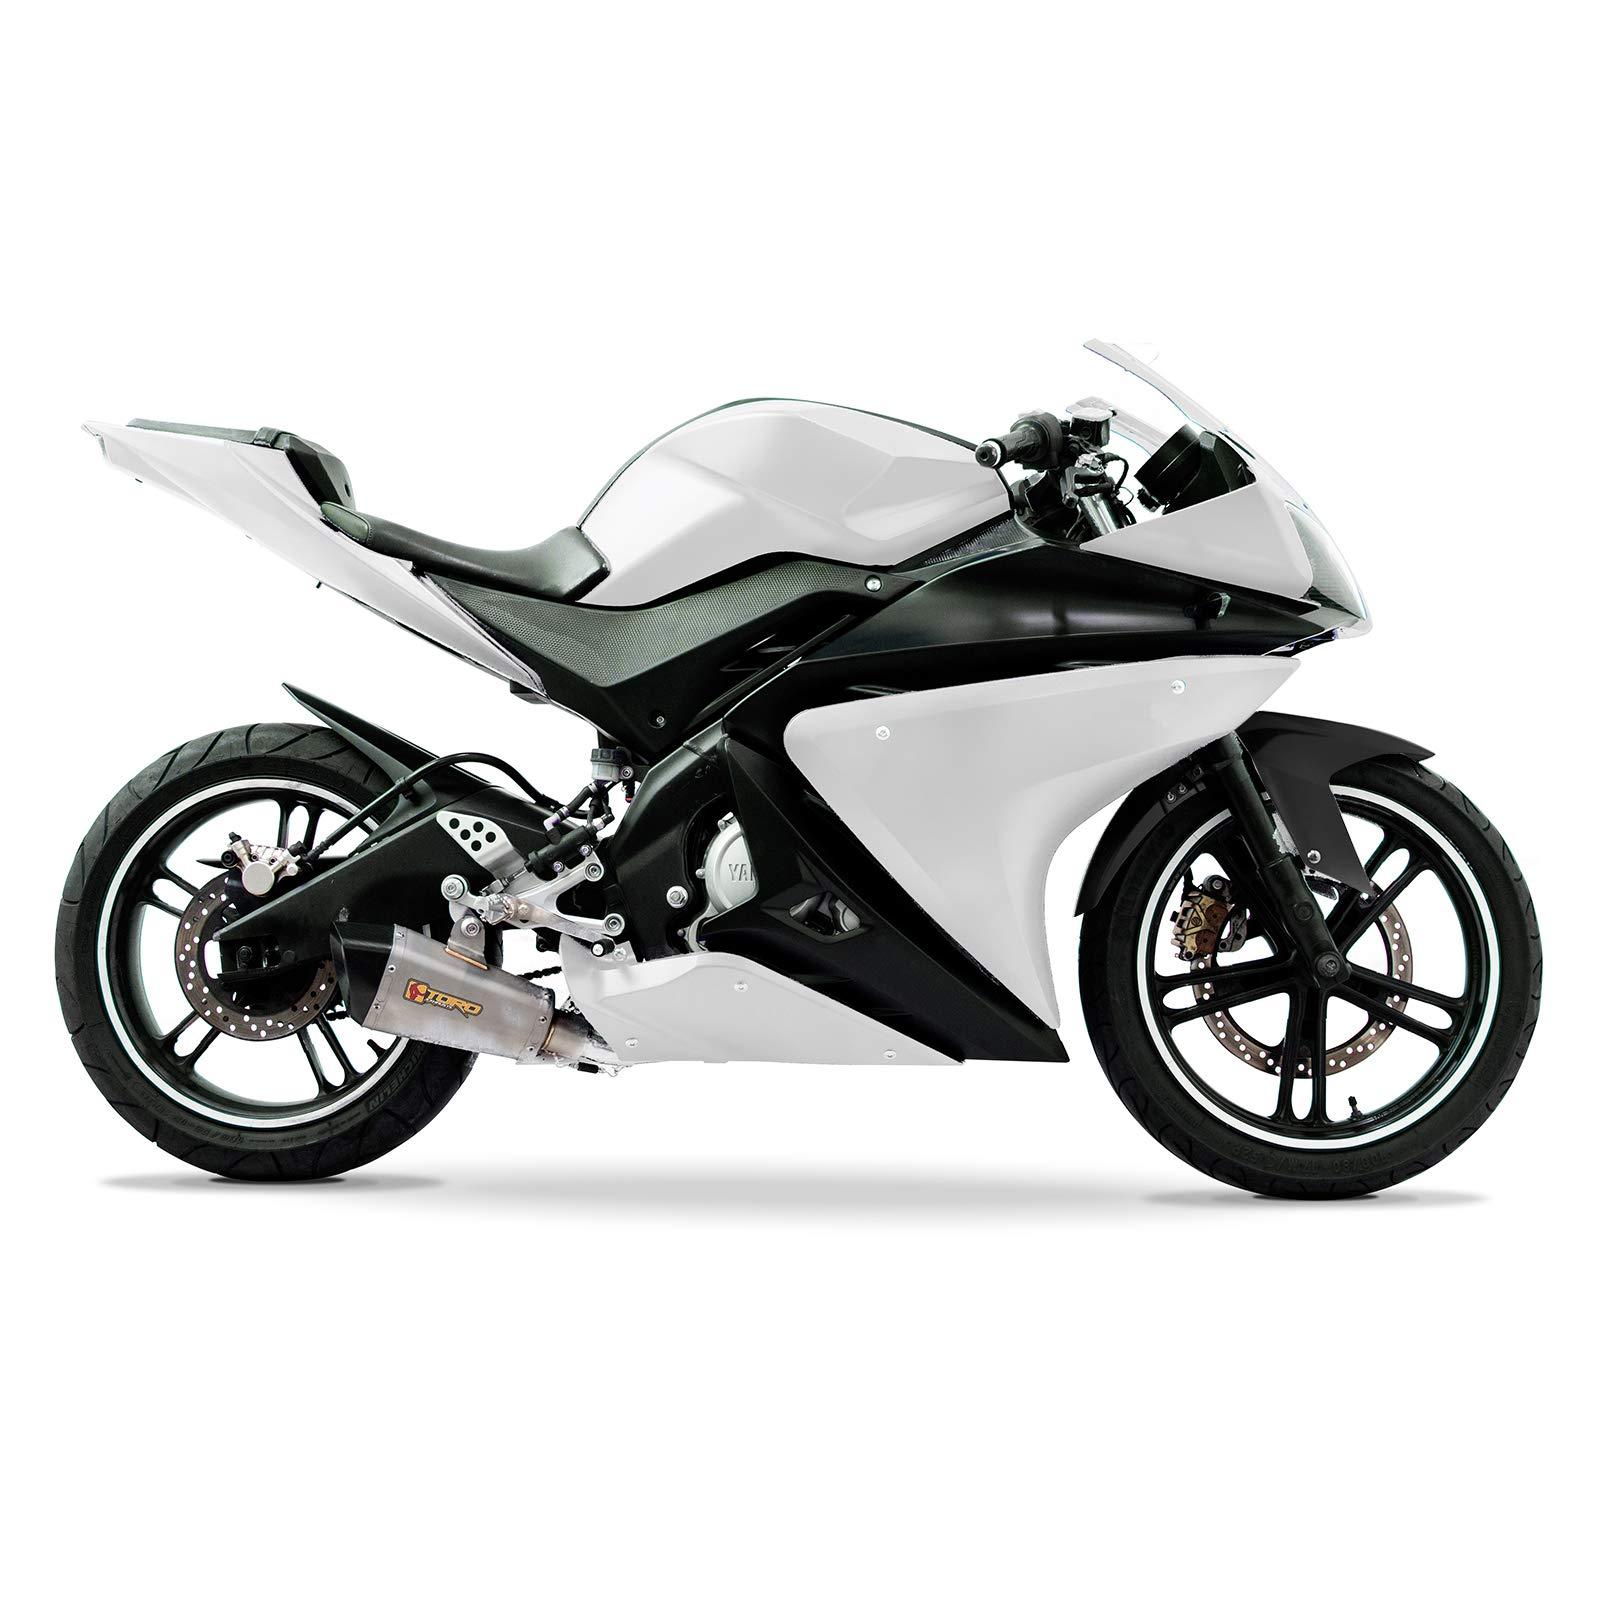 Yamaha YZF R 125 GP Carbon Exhaust 08//13 2012 UK Stock